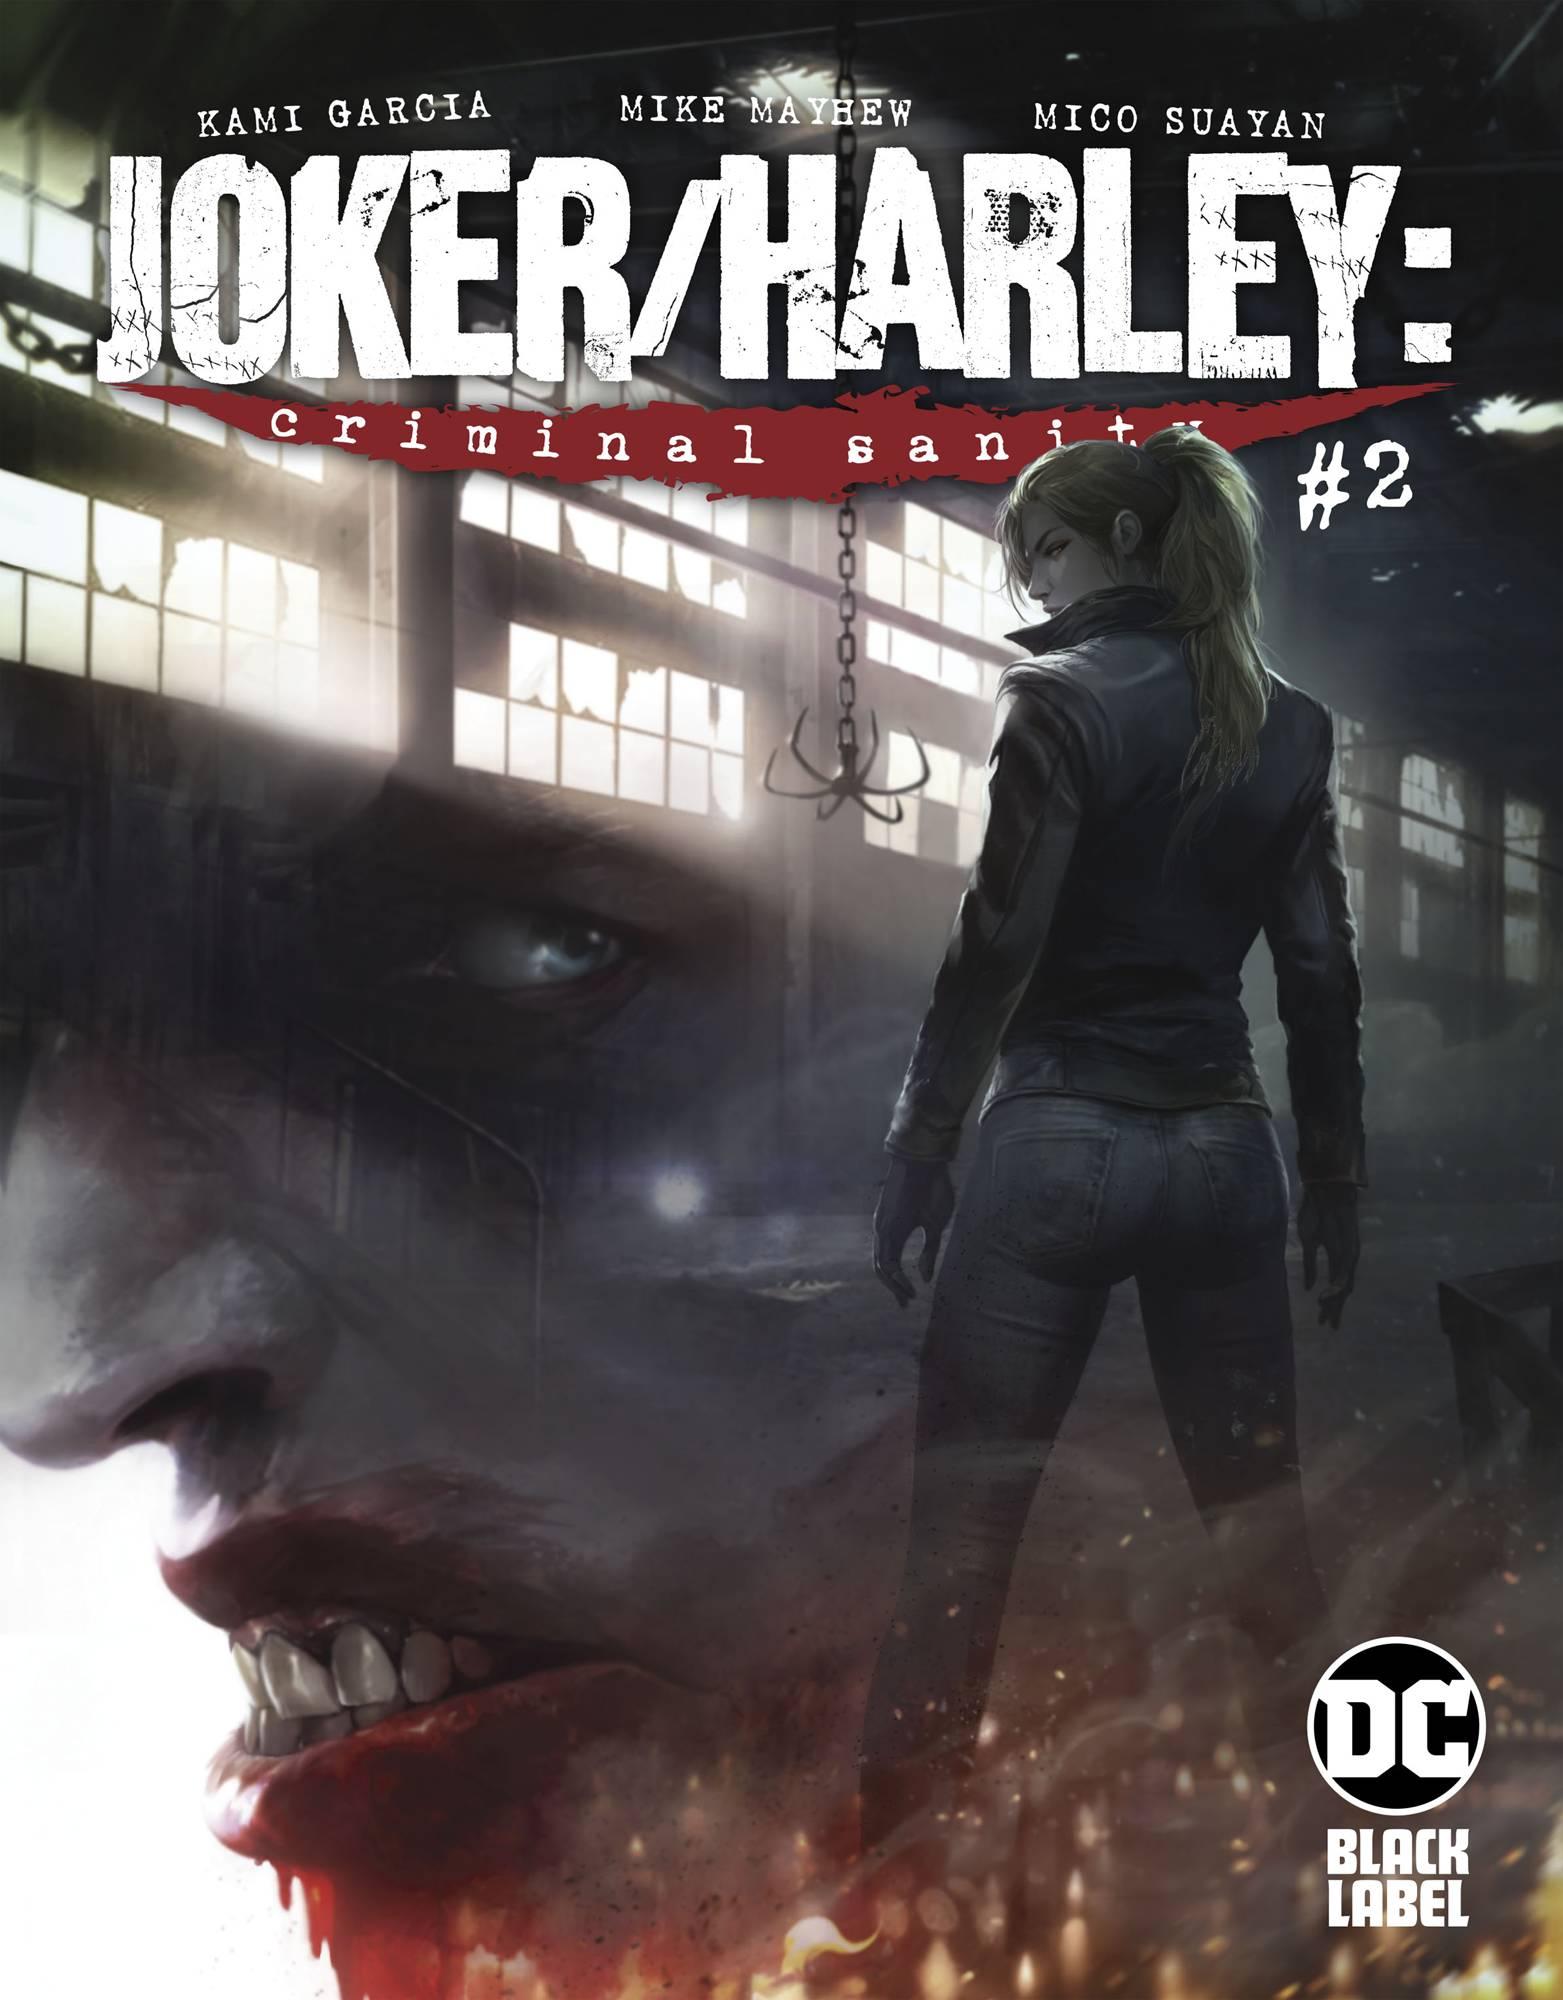 Joker/Harley: Criminal Sanity #2 (2020)